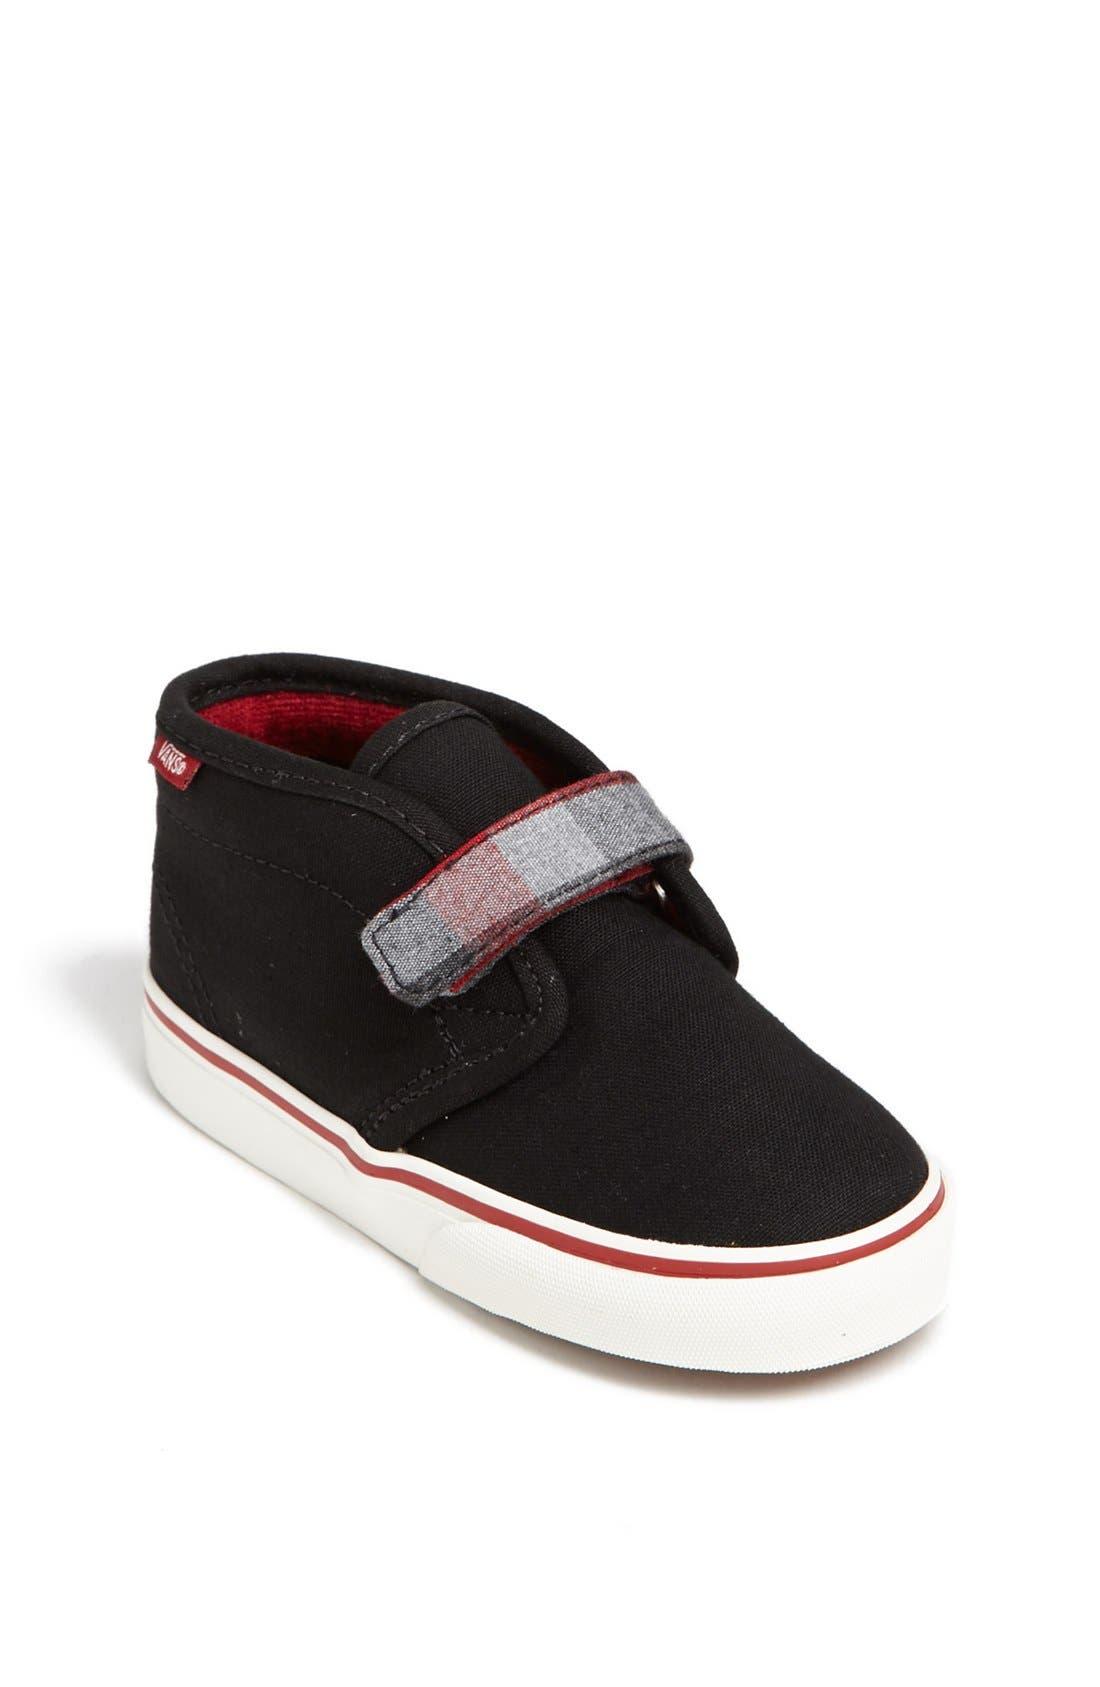 Alternate Image 1 Selected - Vans Chukka Sneaker (Baby, Walker & Toddler)